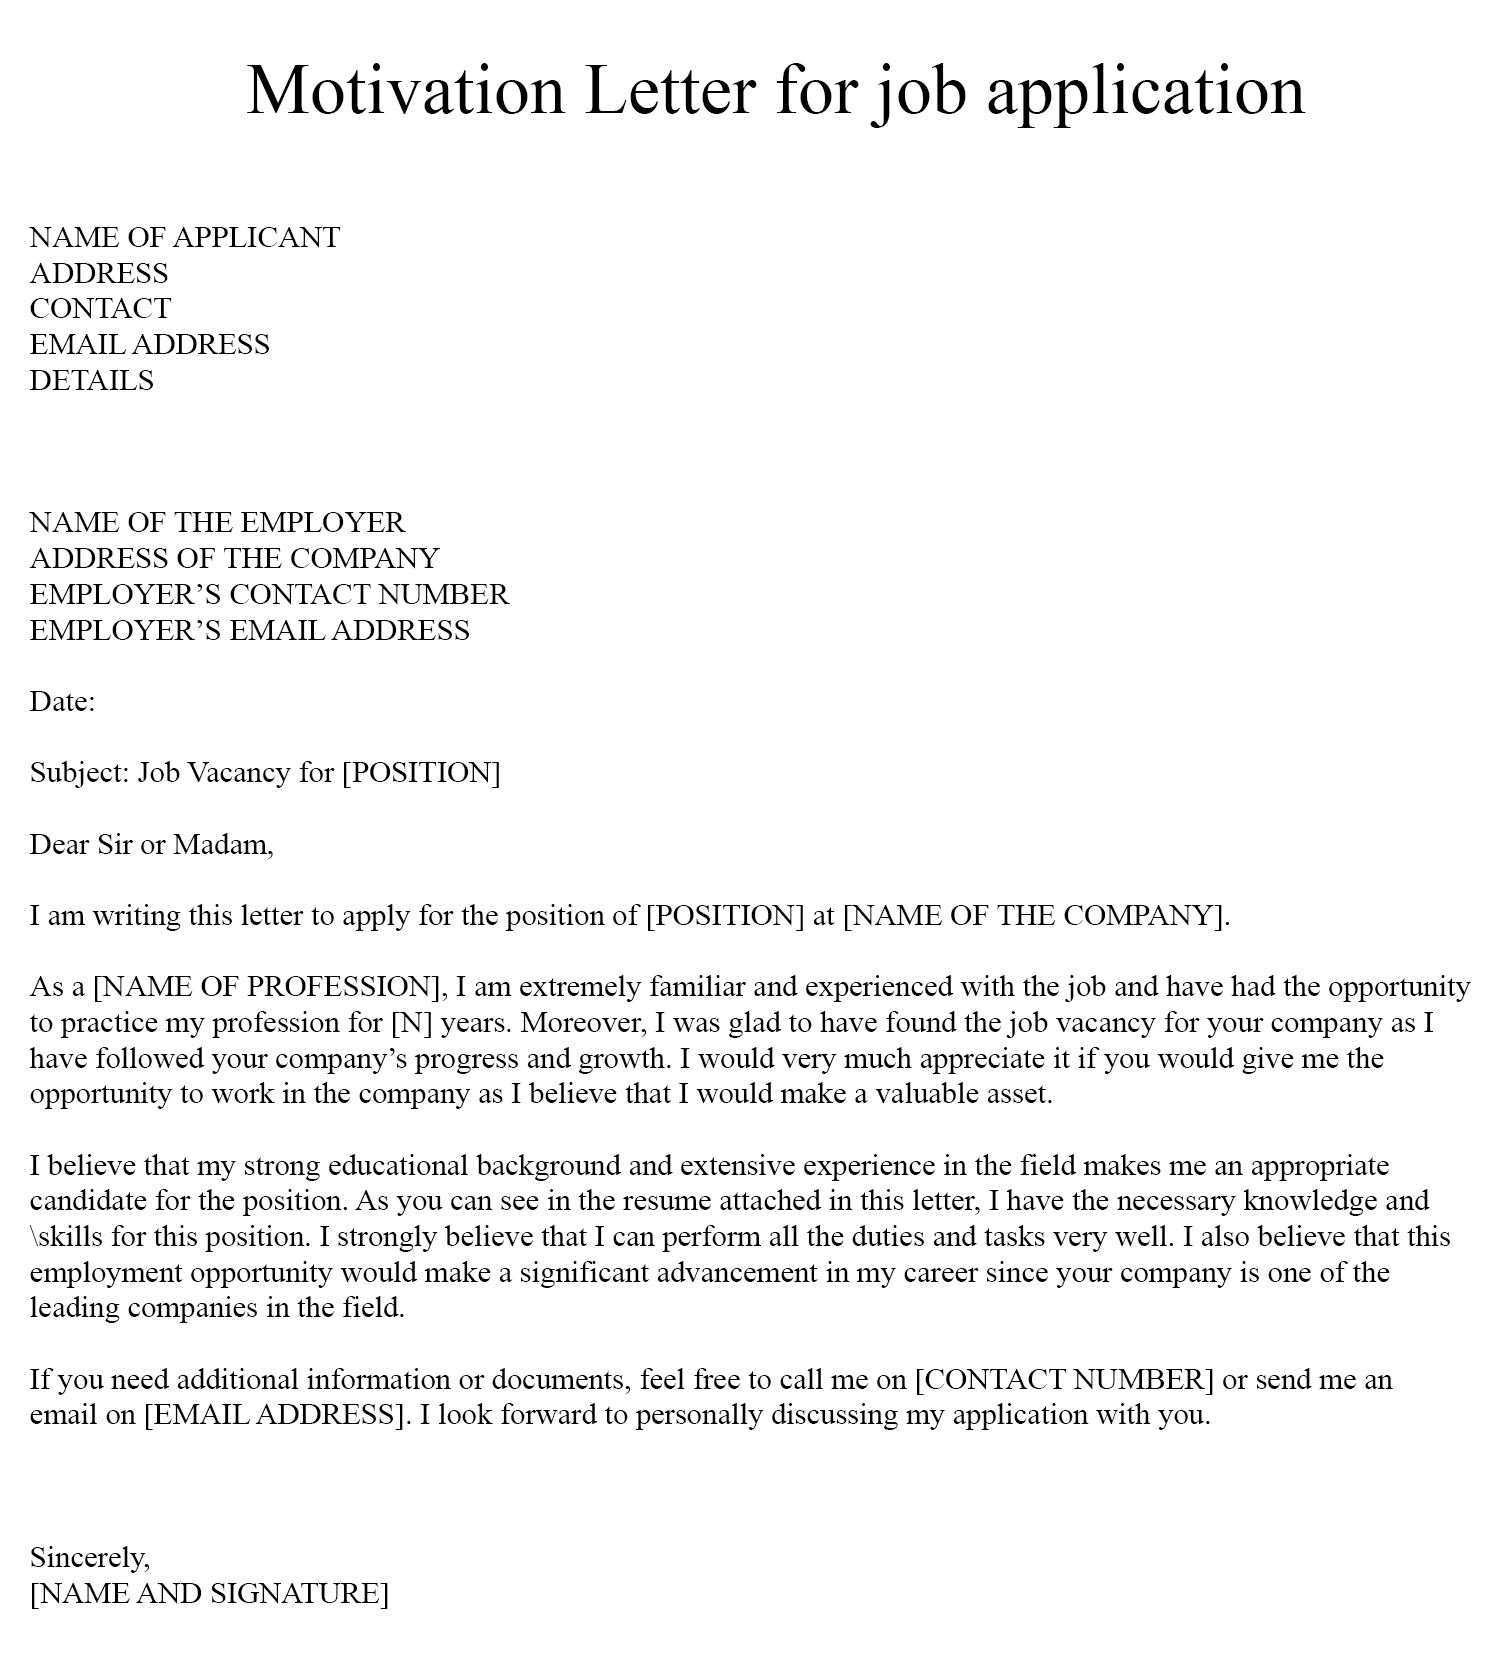 Motivation-Letter-for-job-application